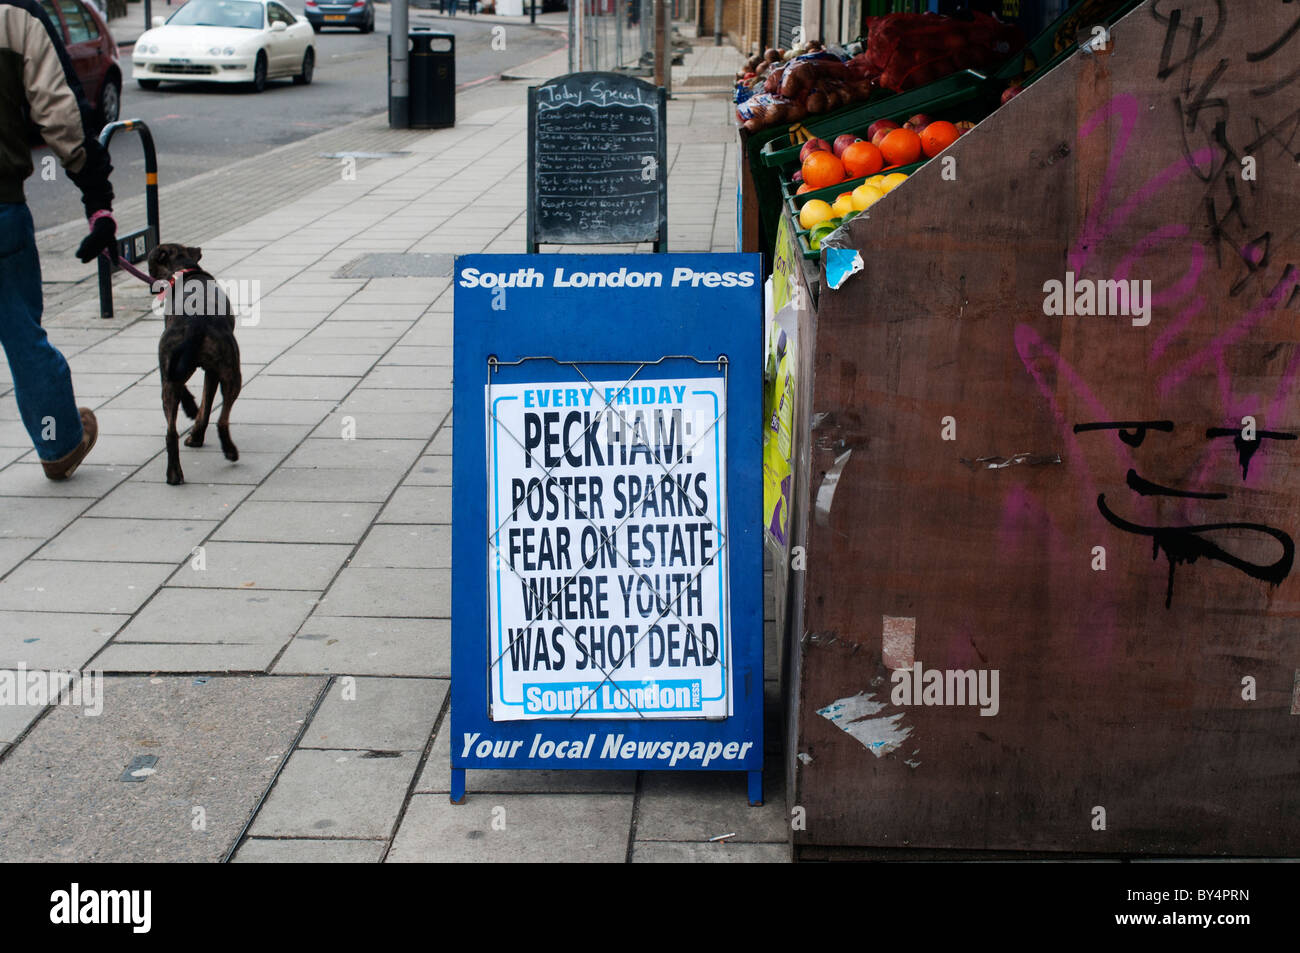 Peckham. Newspaper placard - Stock Image